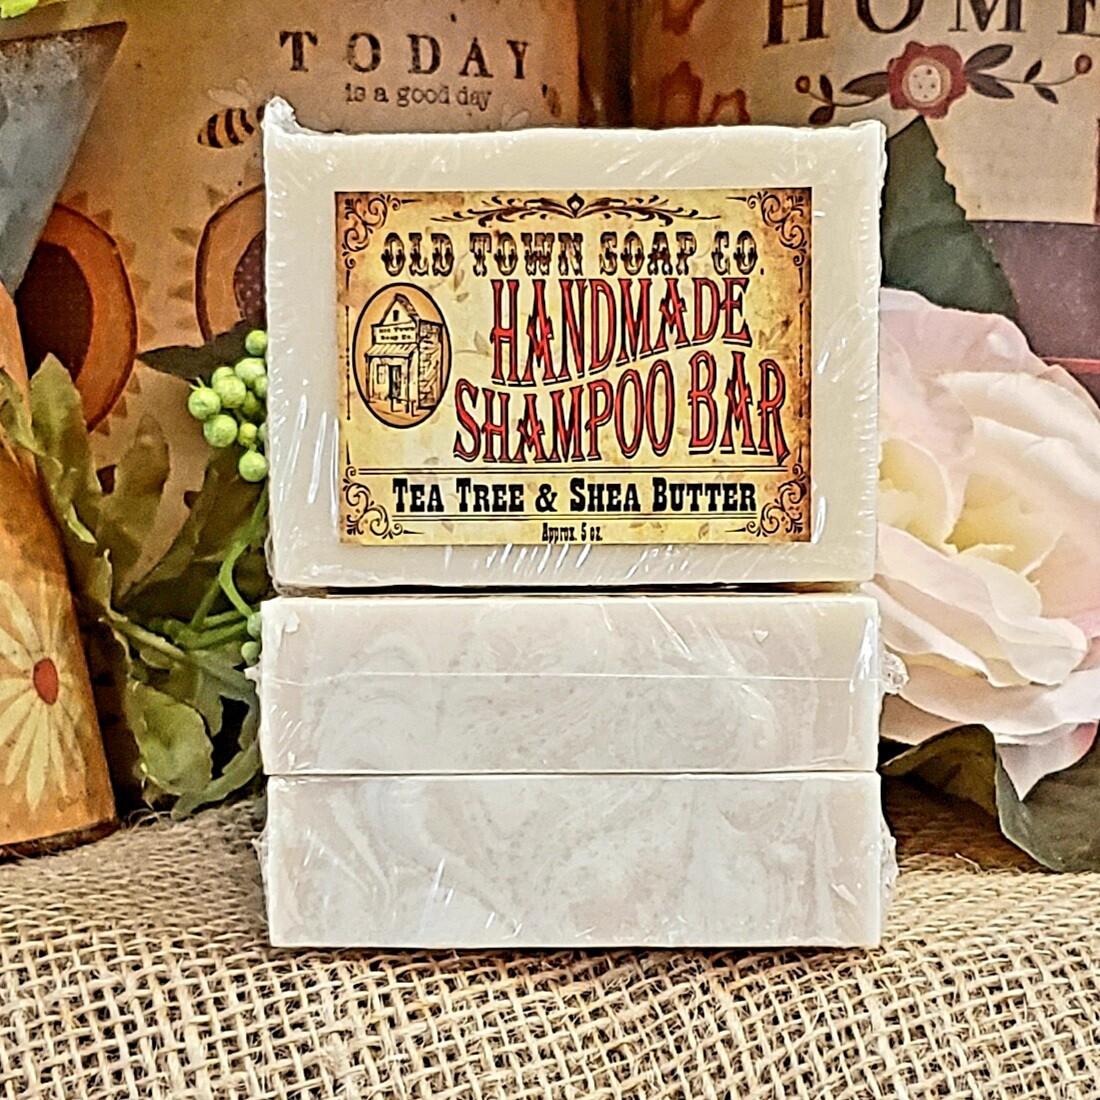 Tea Tree & Shea Butter -Shampoo Bar